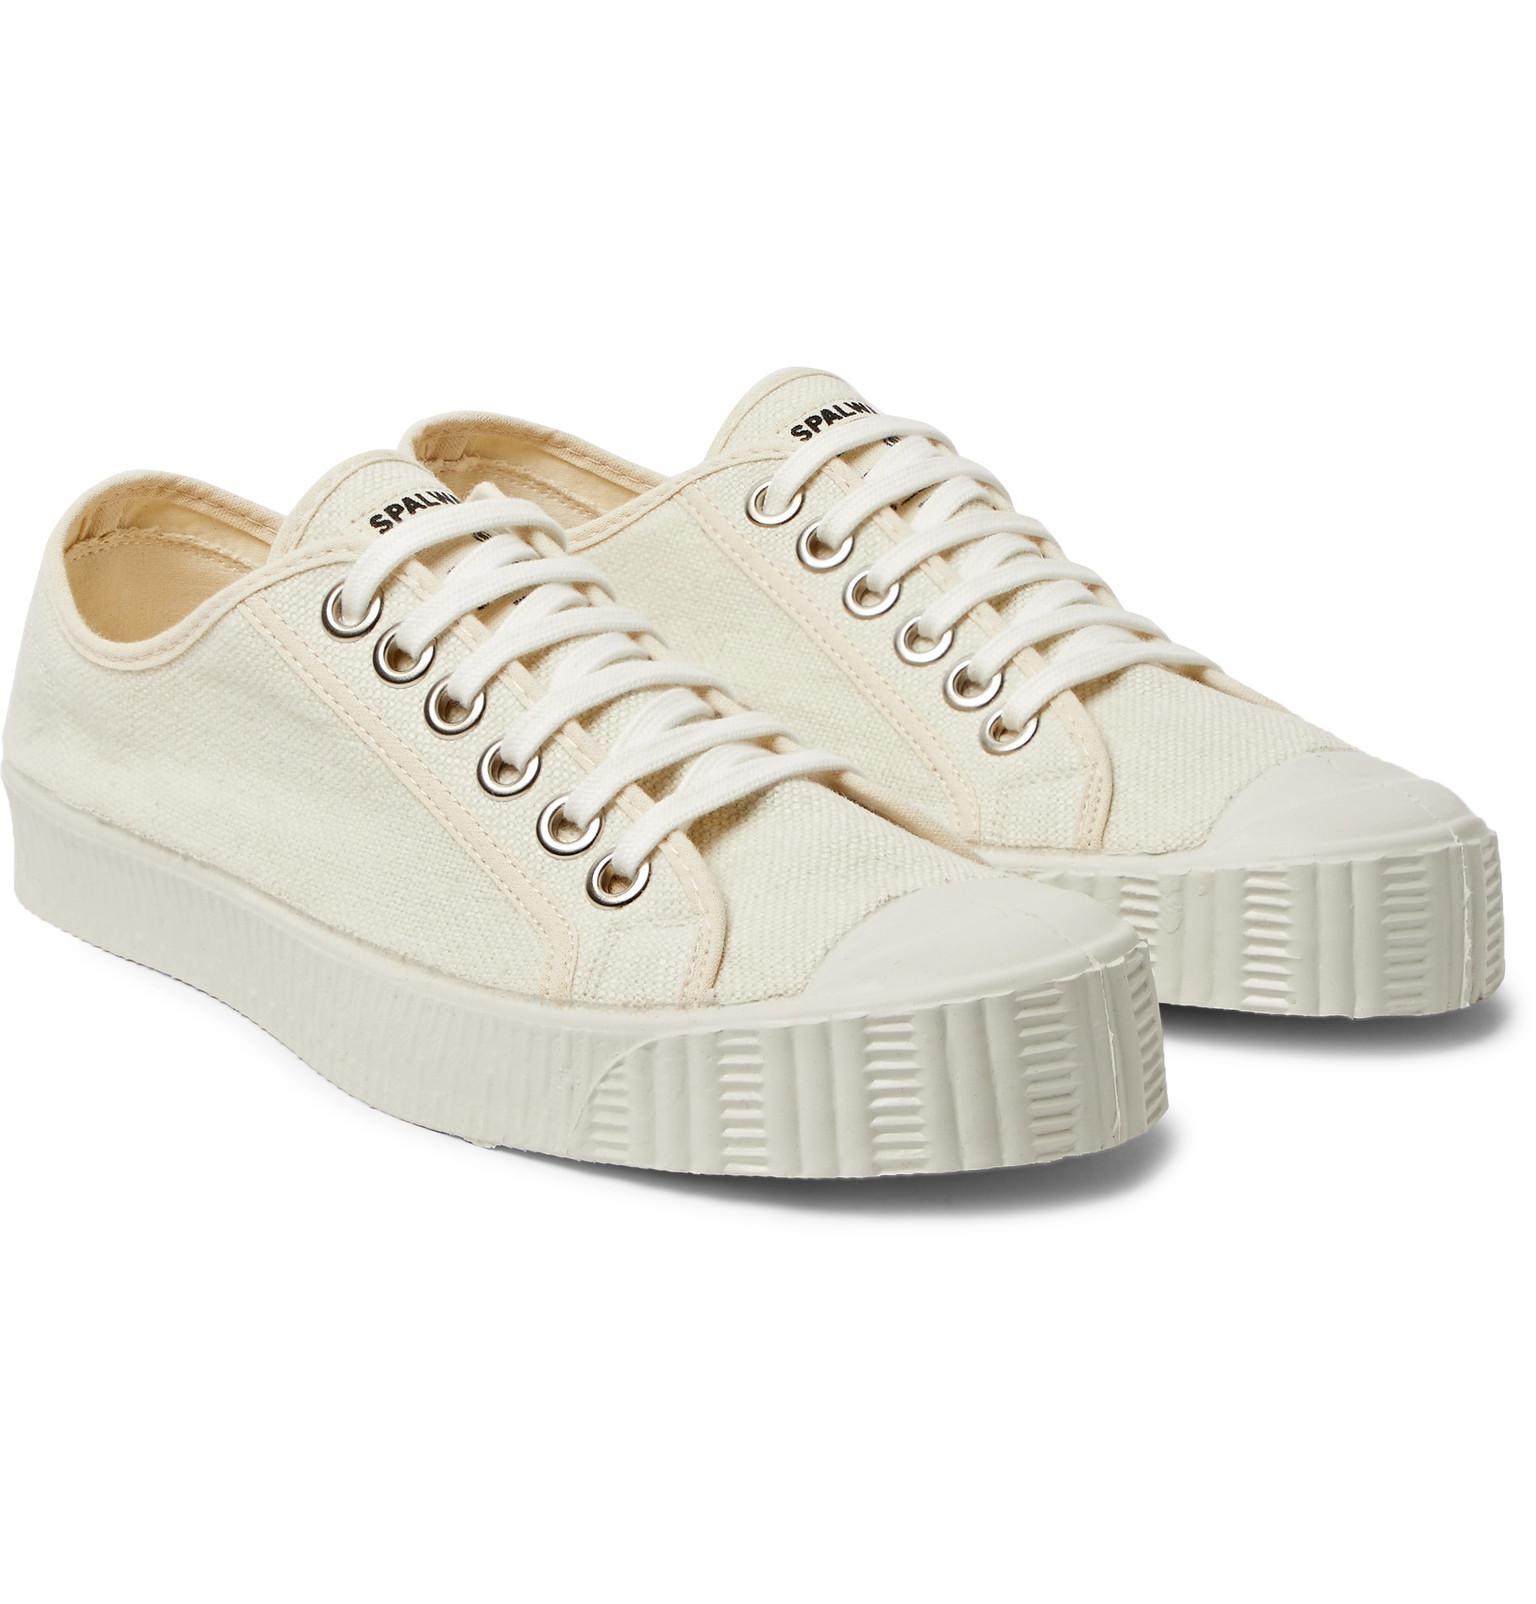 Special Cap-toe Linen-canvas Sneakers - BlackSpalwart oh61IUJTIs